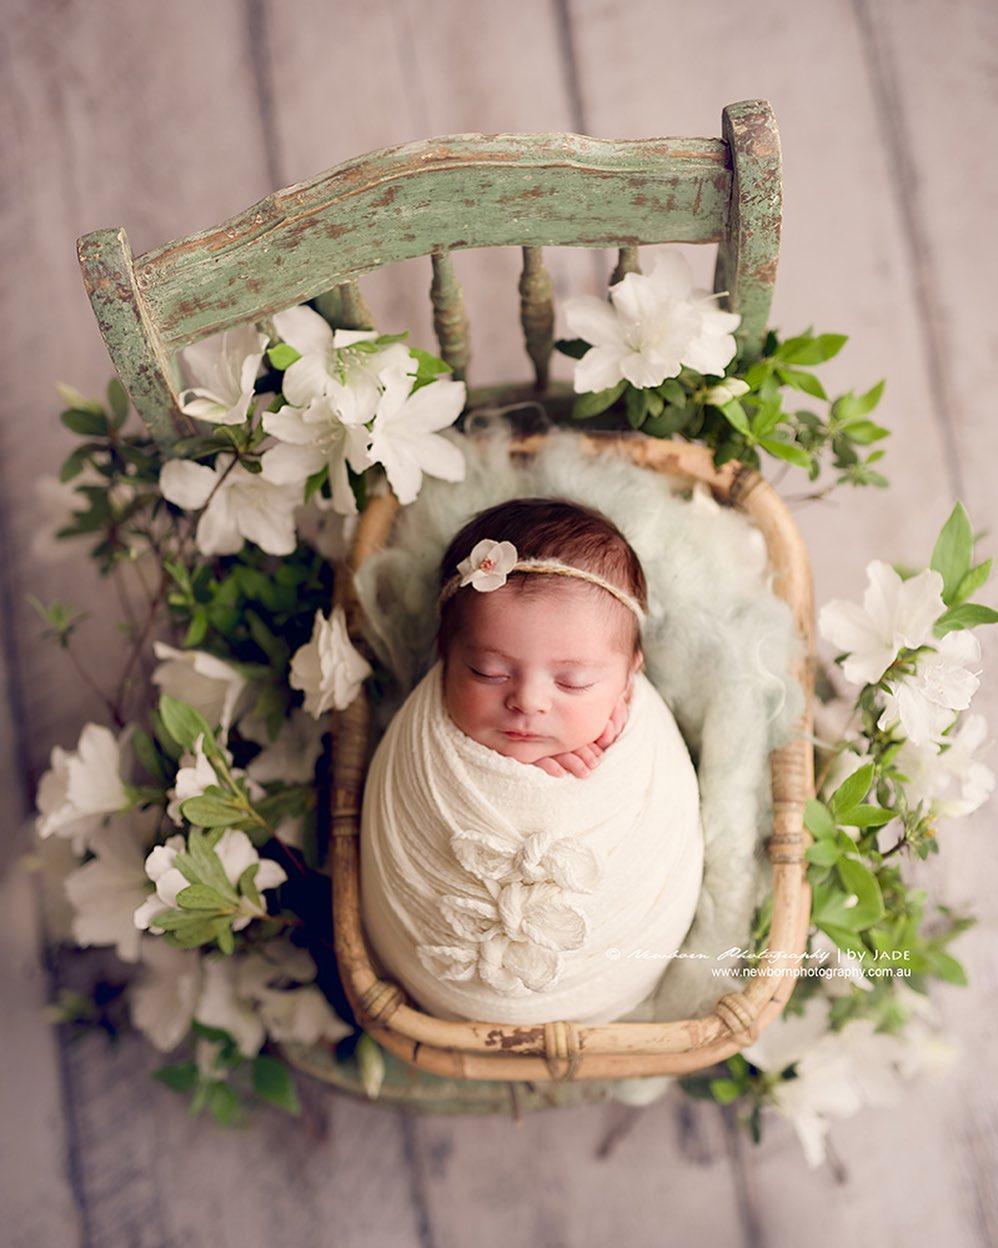 fotos artísticas de bebés